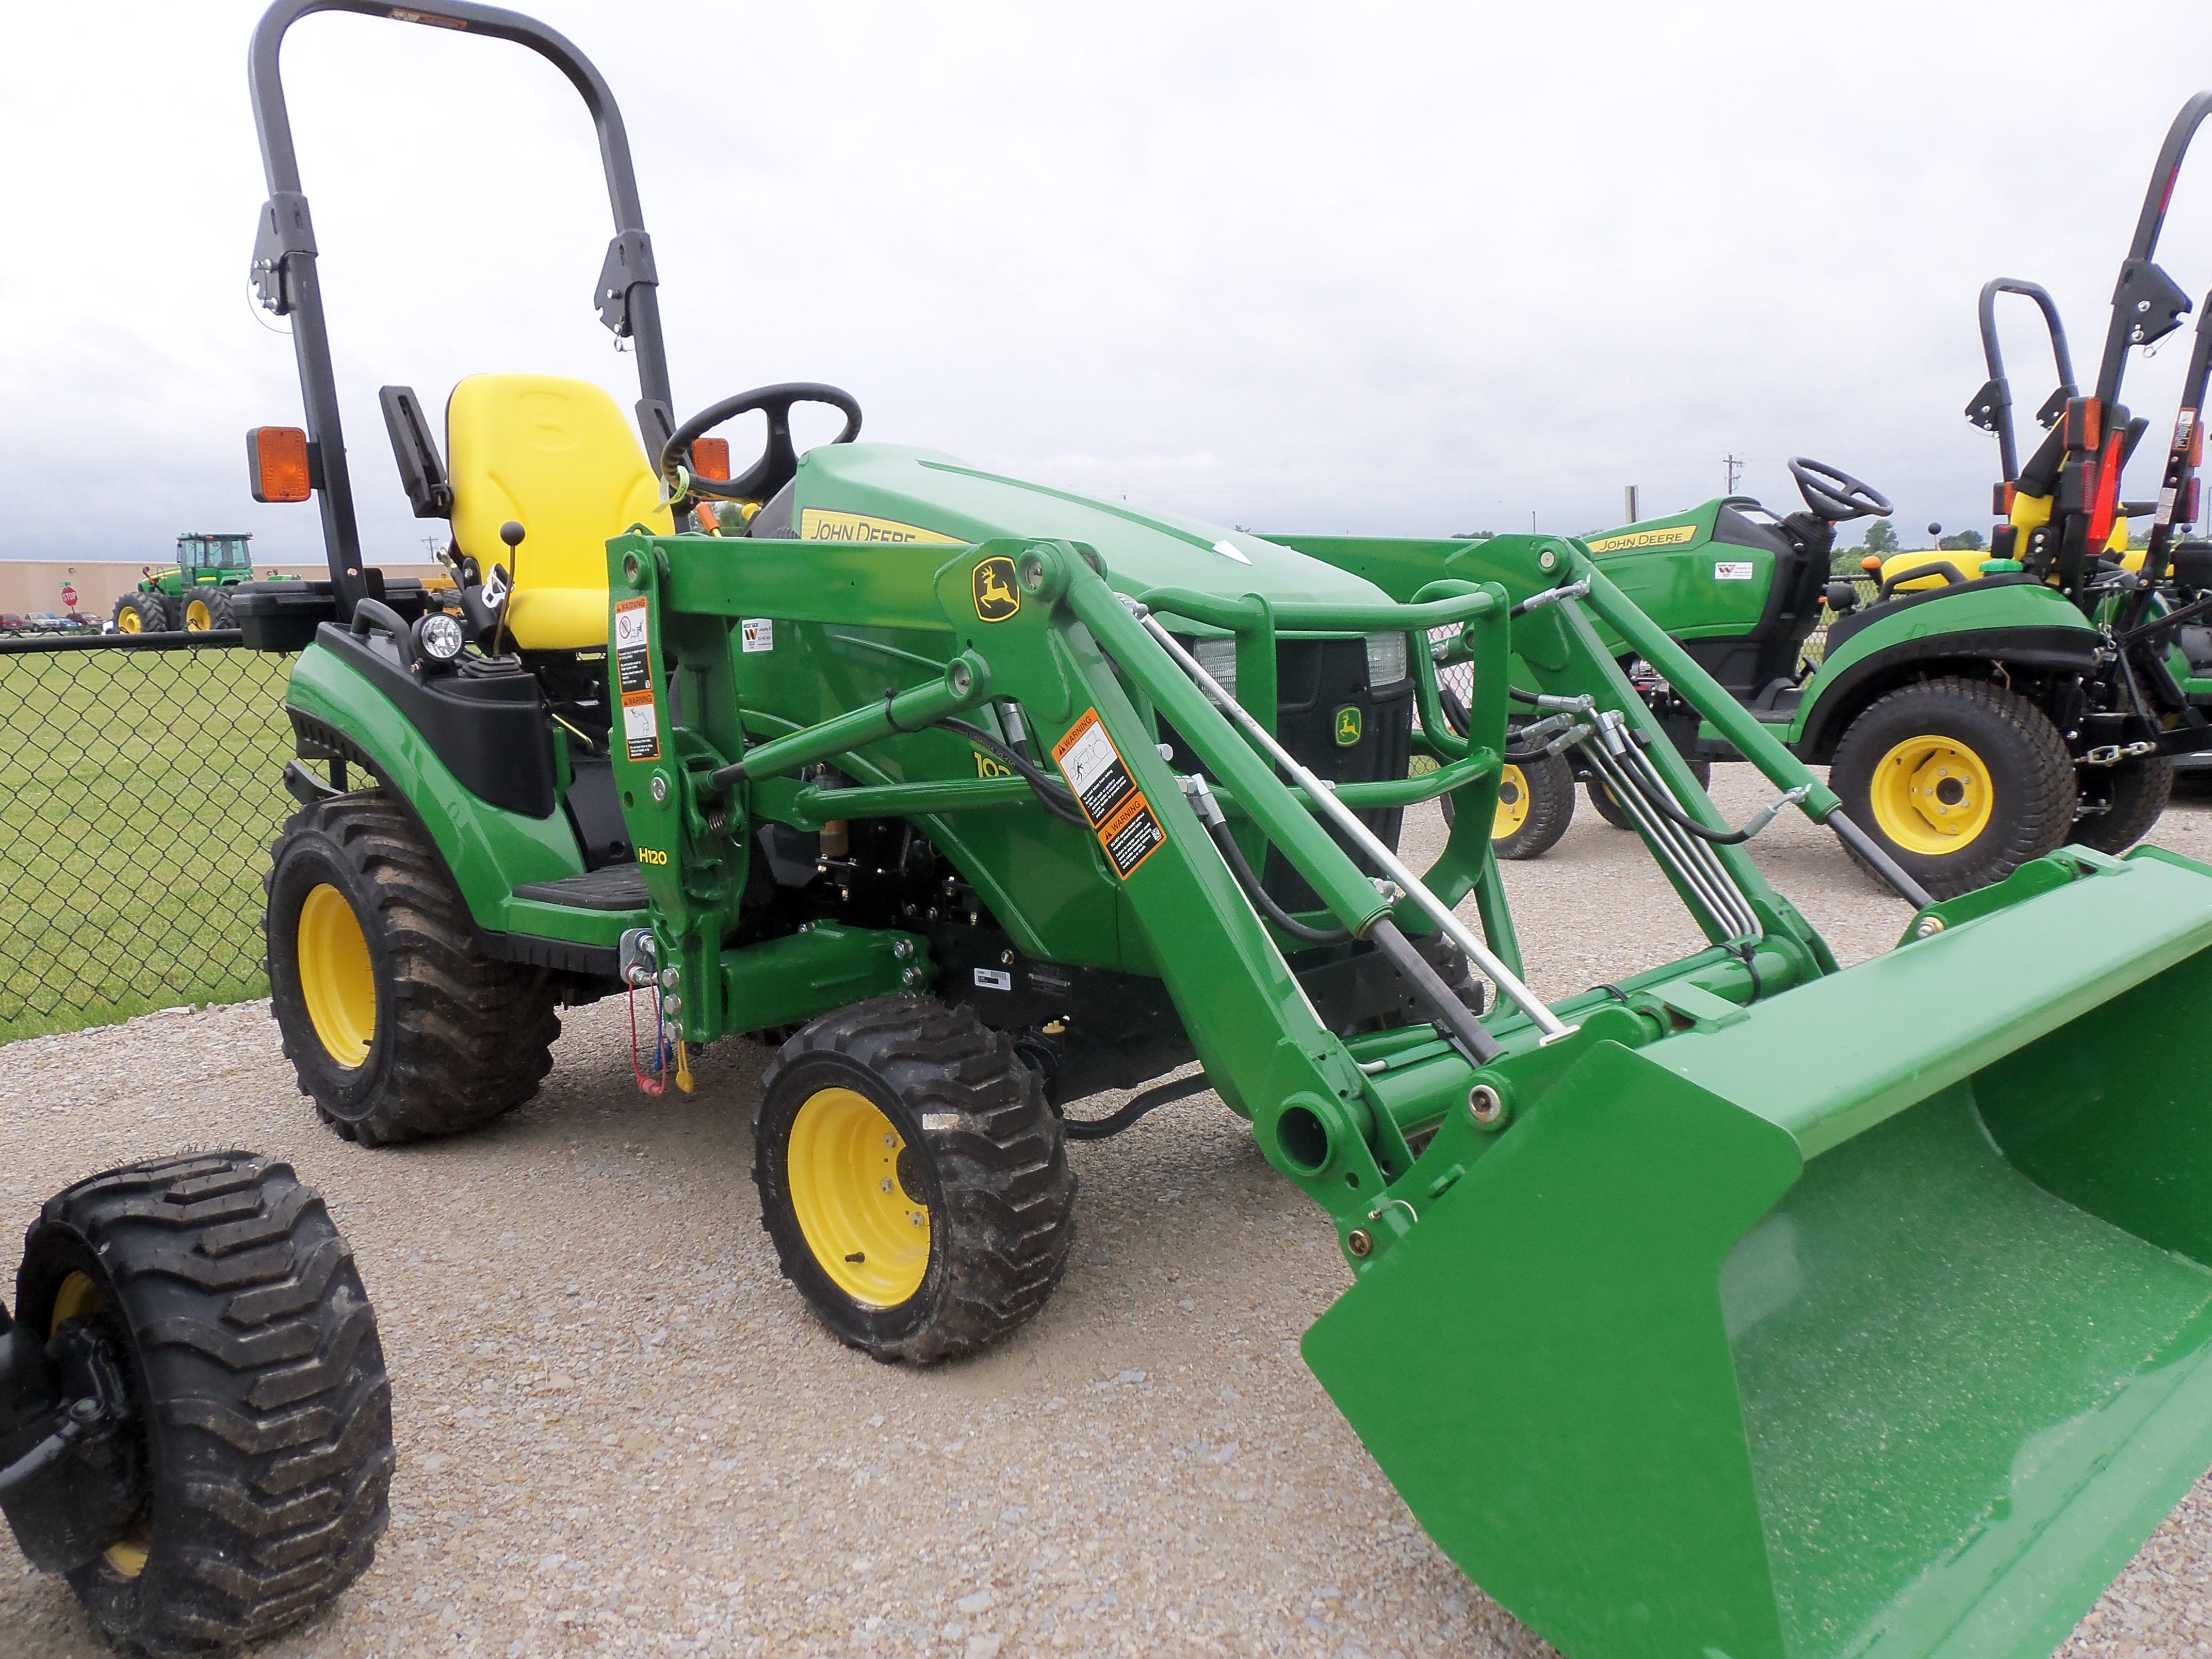 Another 1026R with H120 loader | John Deere equipment | Pinterest